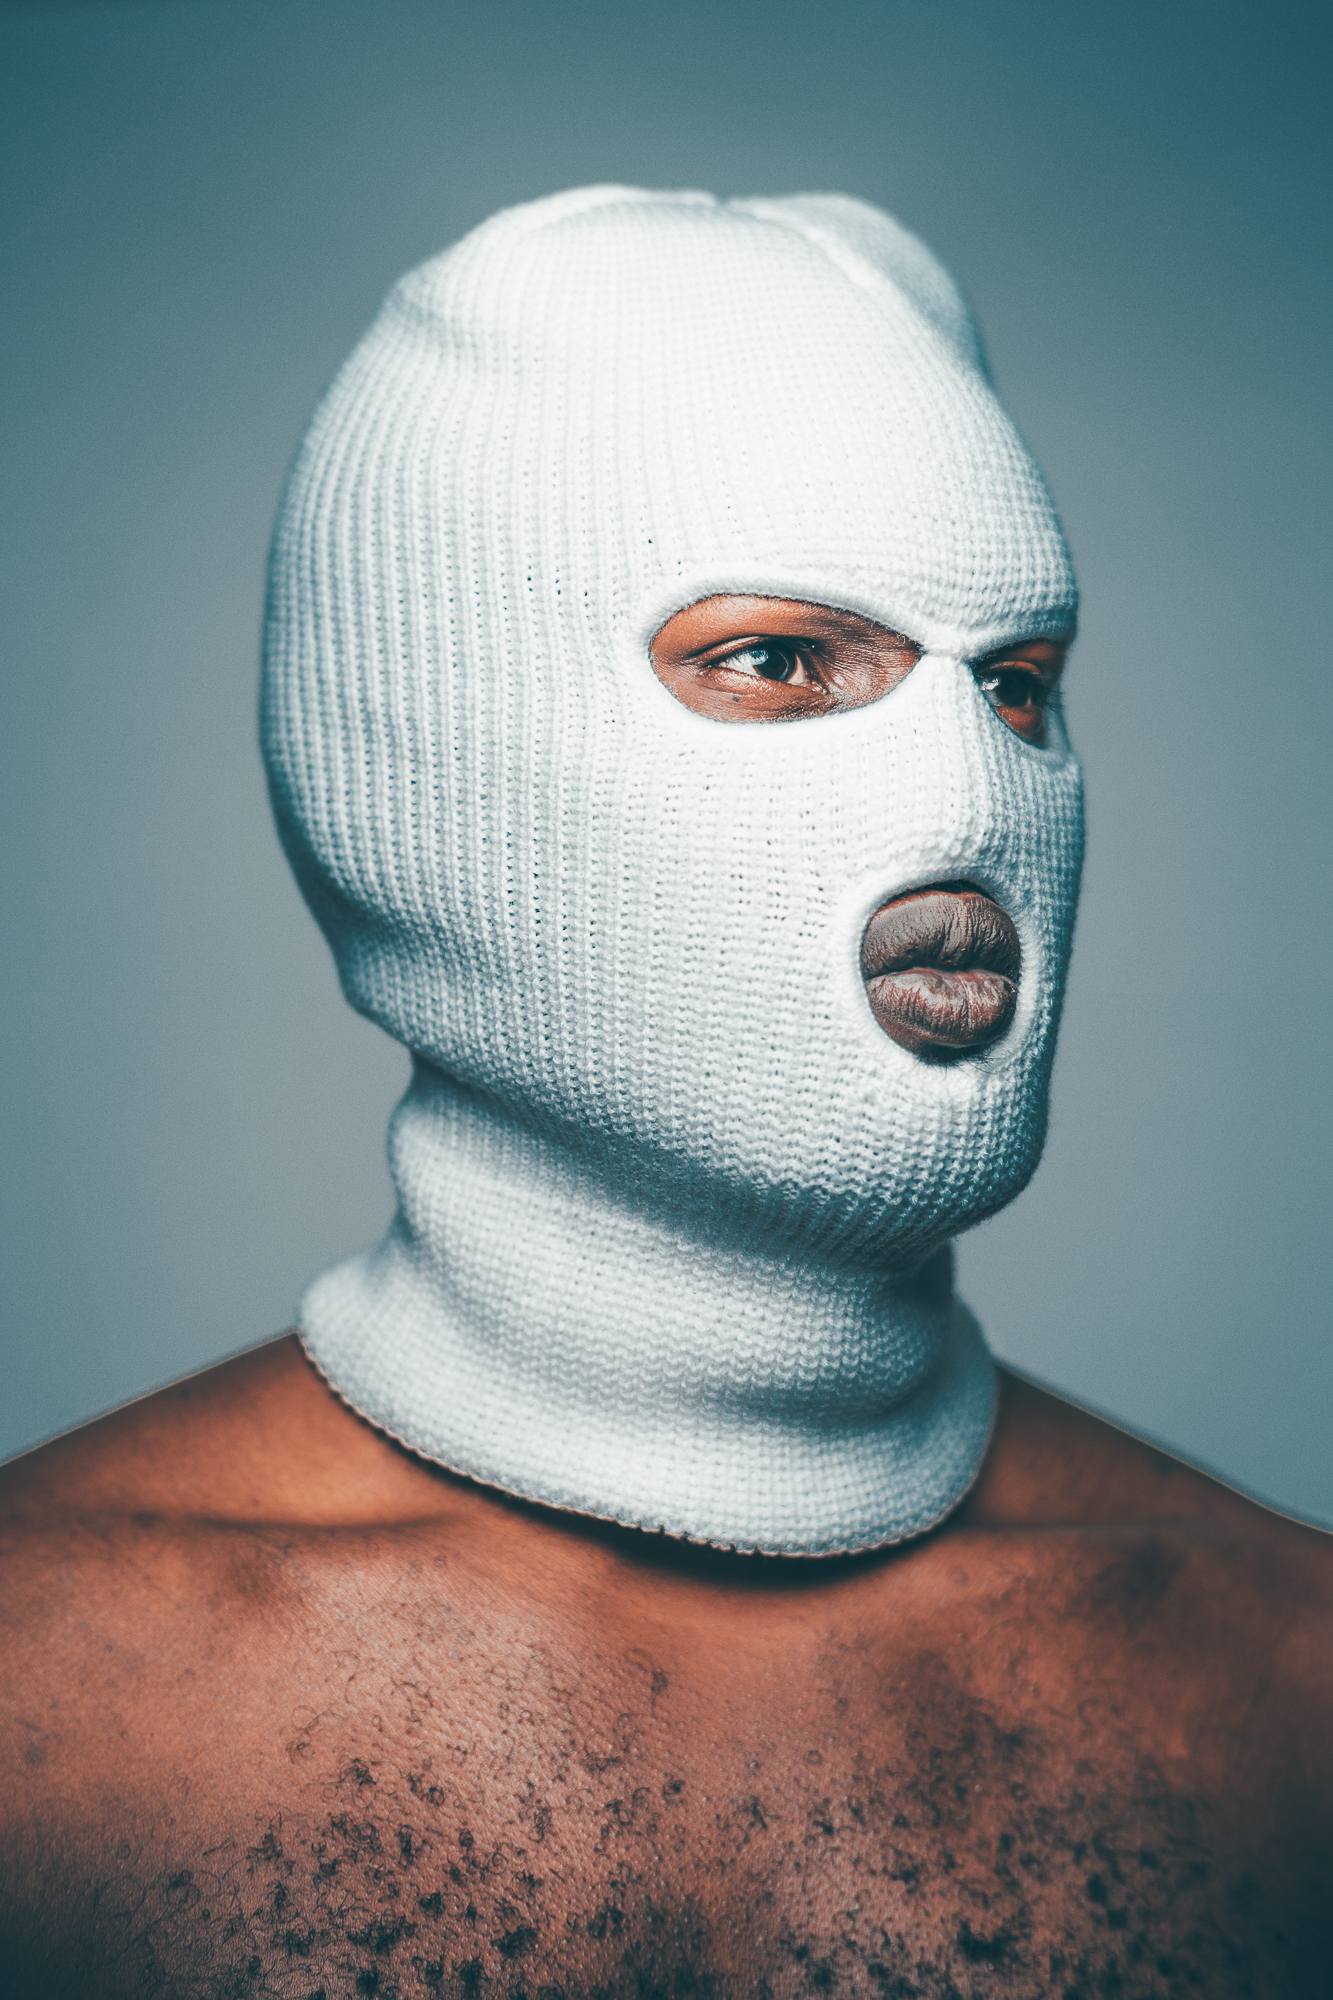 portrait fotografie stuttgart